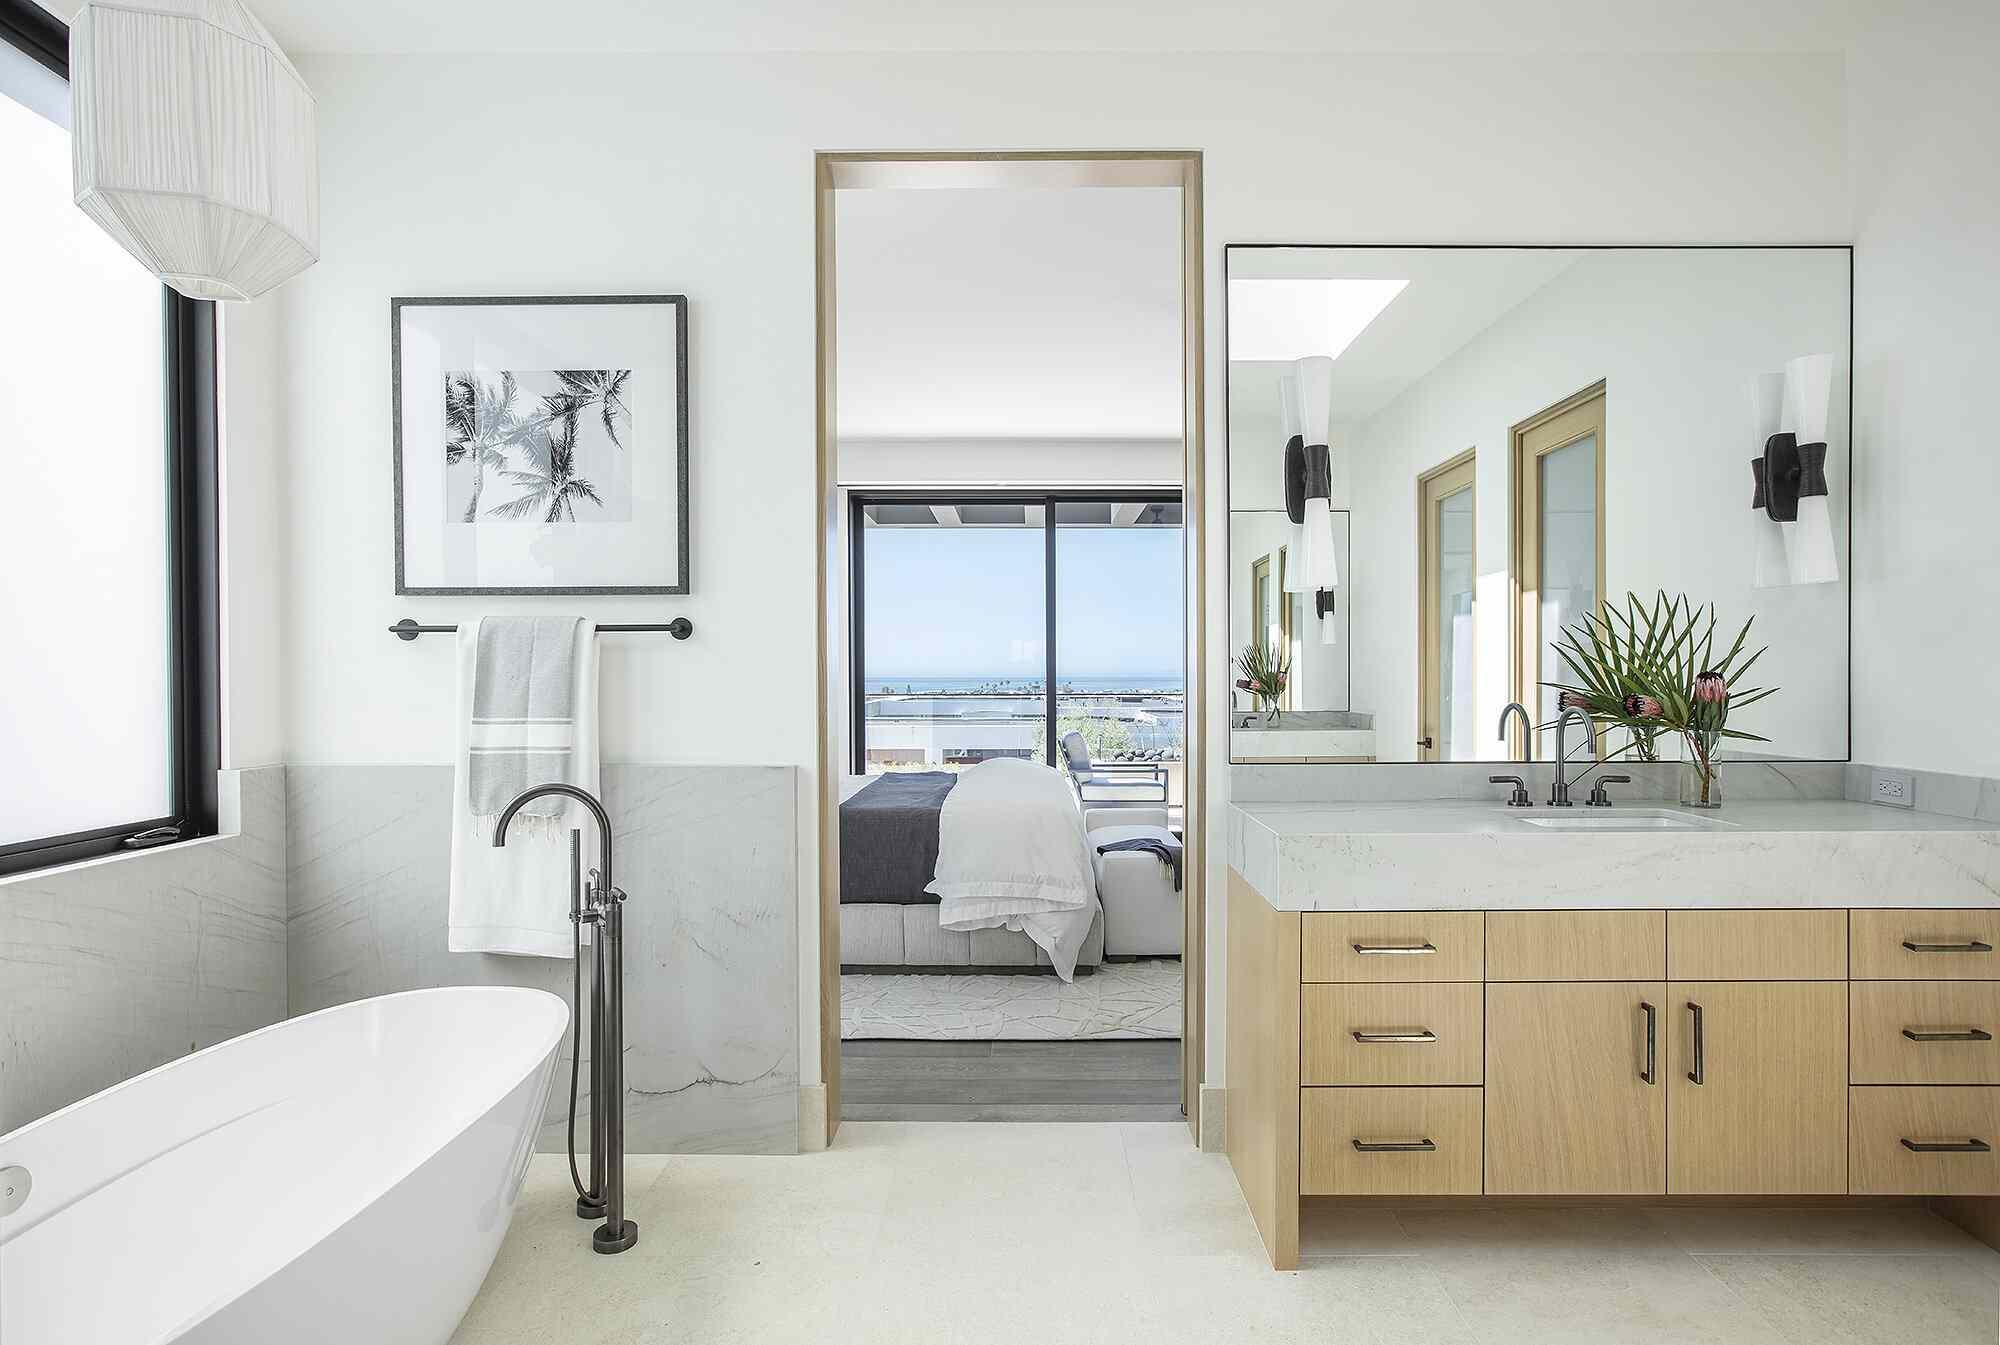 Master bathroom with light wood vanity, marble sink